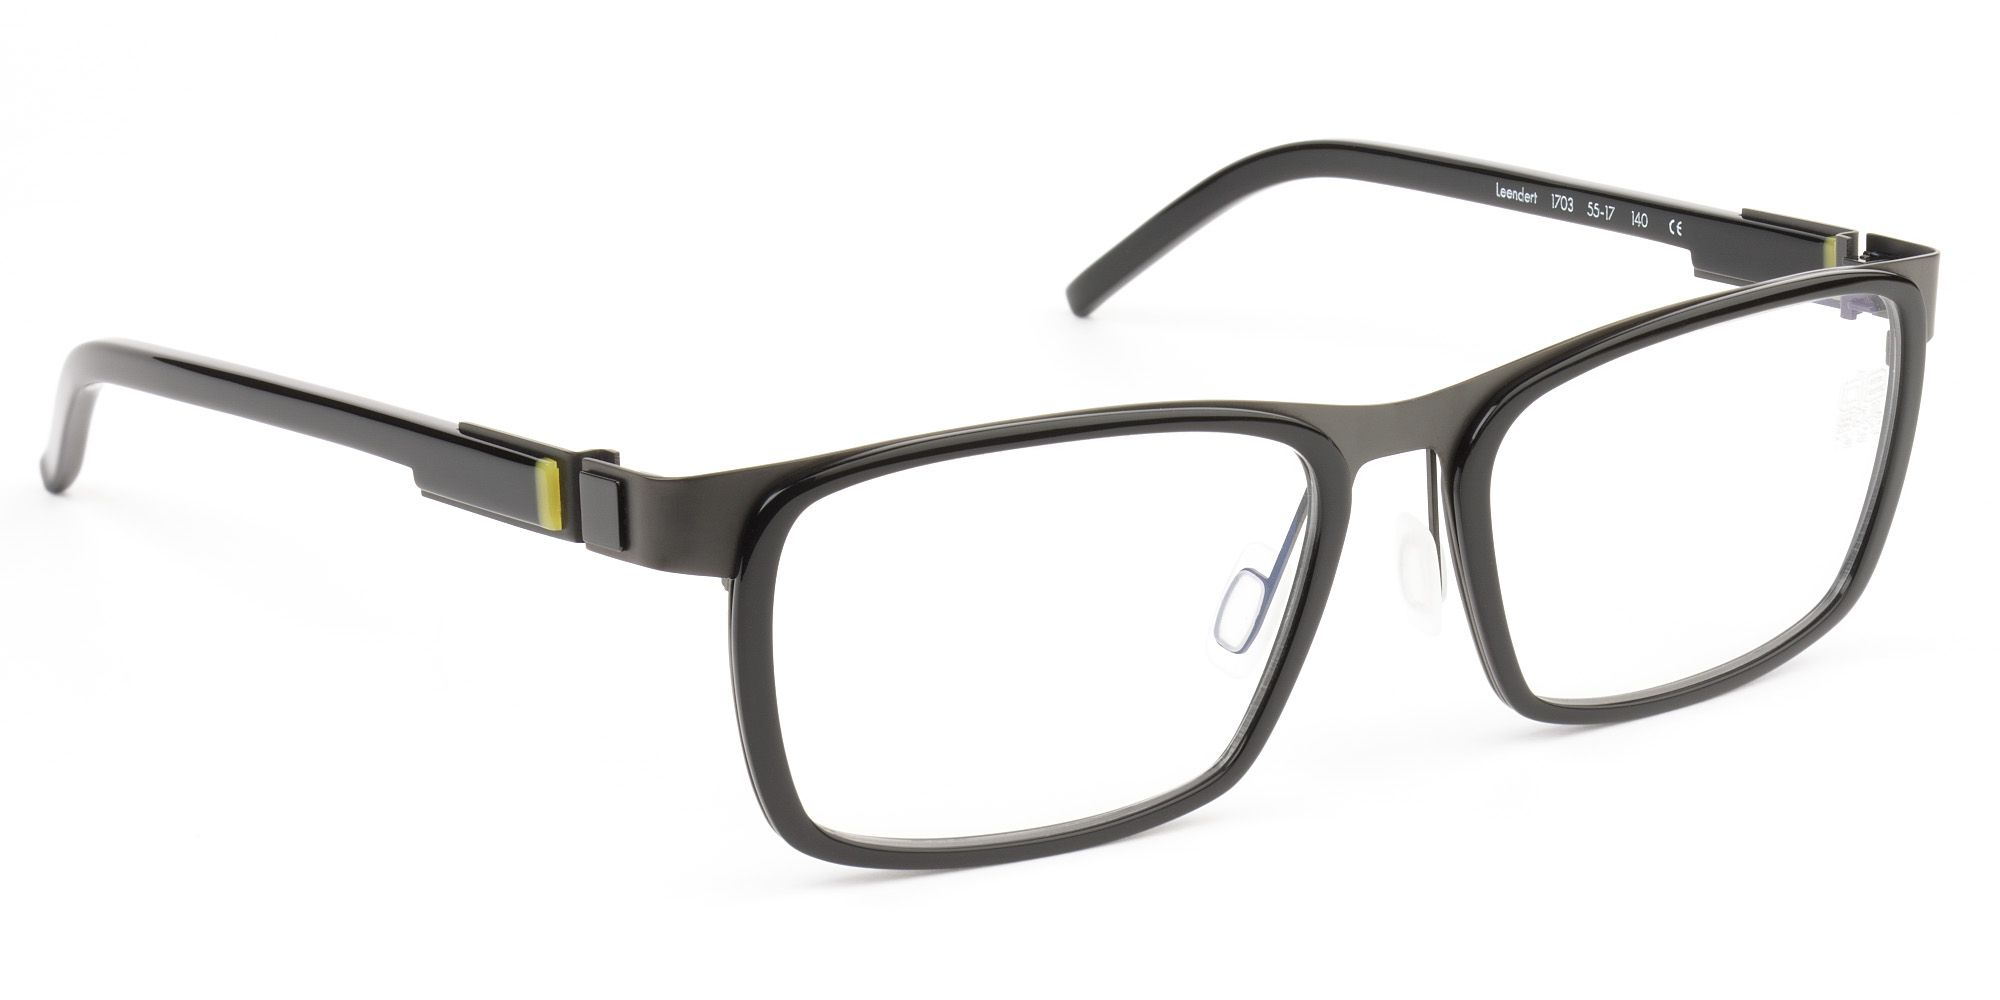 2edb7ba1bde8 De Stijl Holland 1924 eyewear  men eyeglasses frame LEENDERT in black metal  and plastic combo